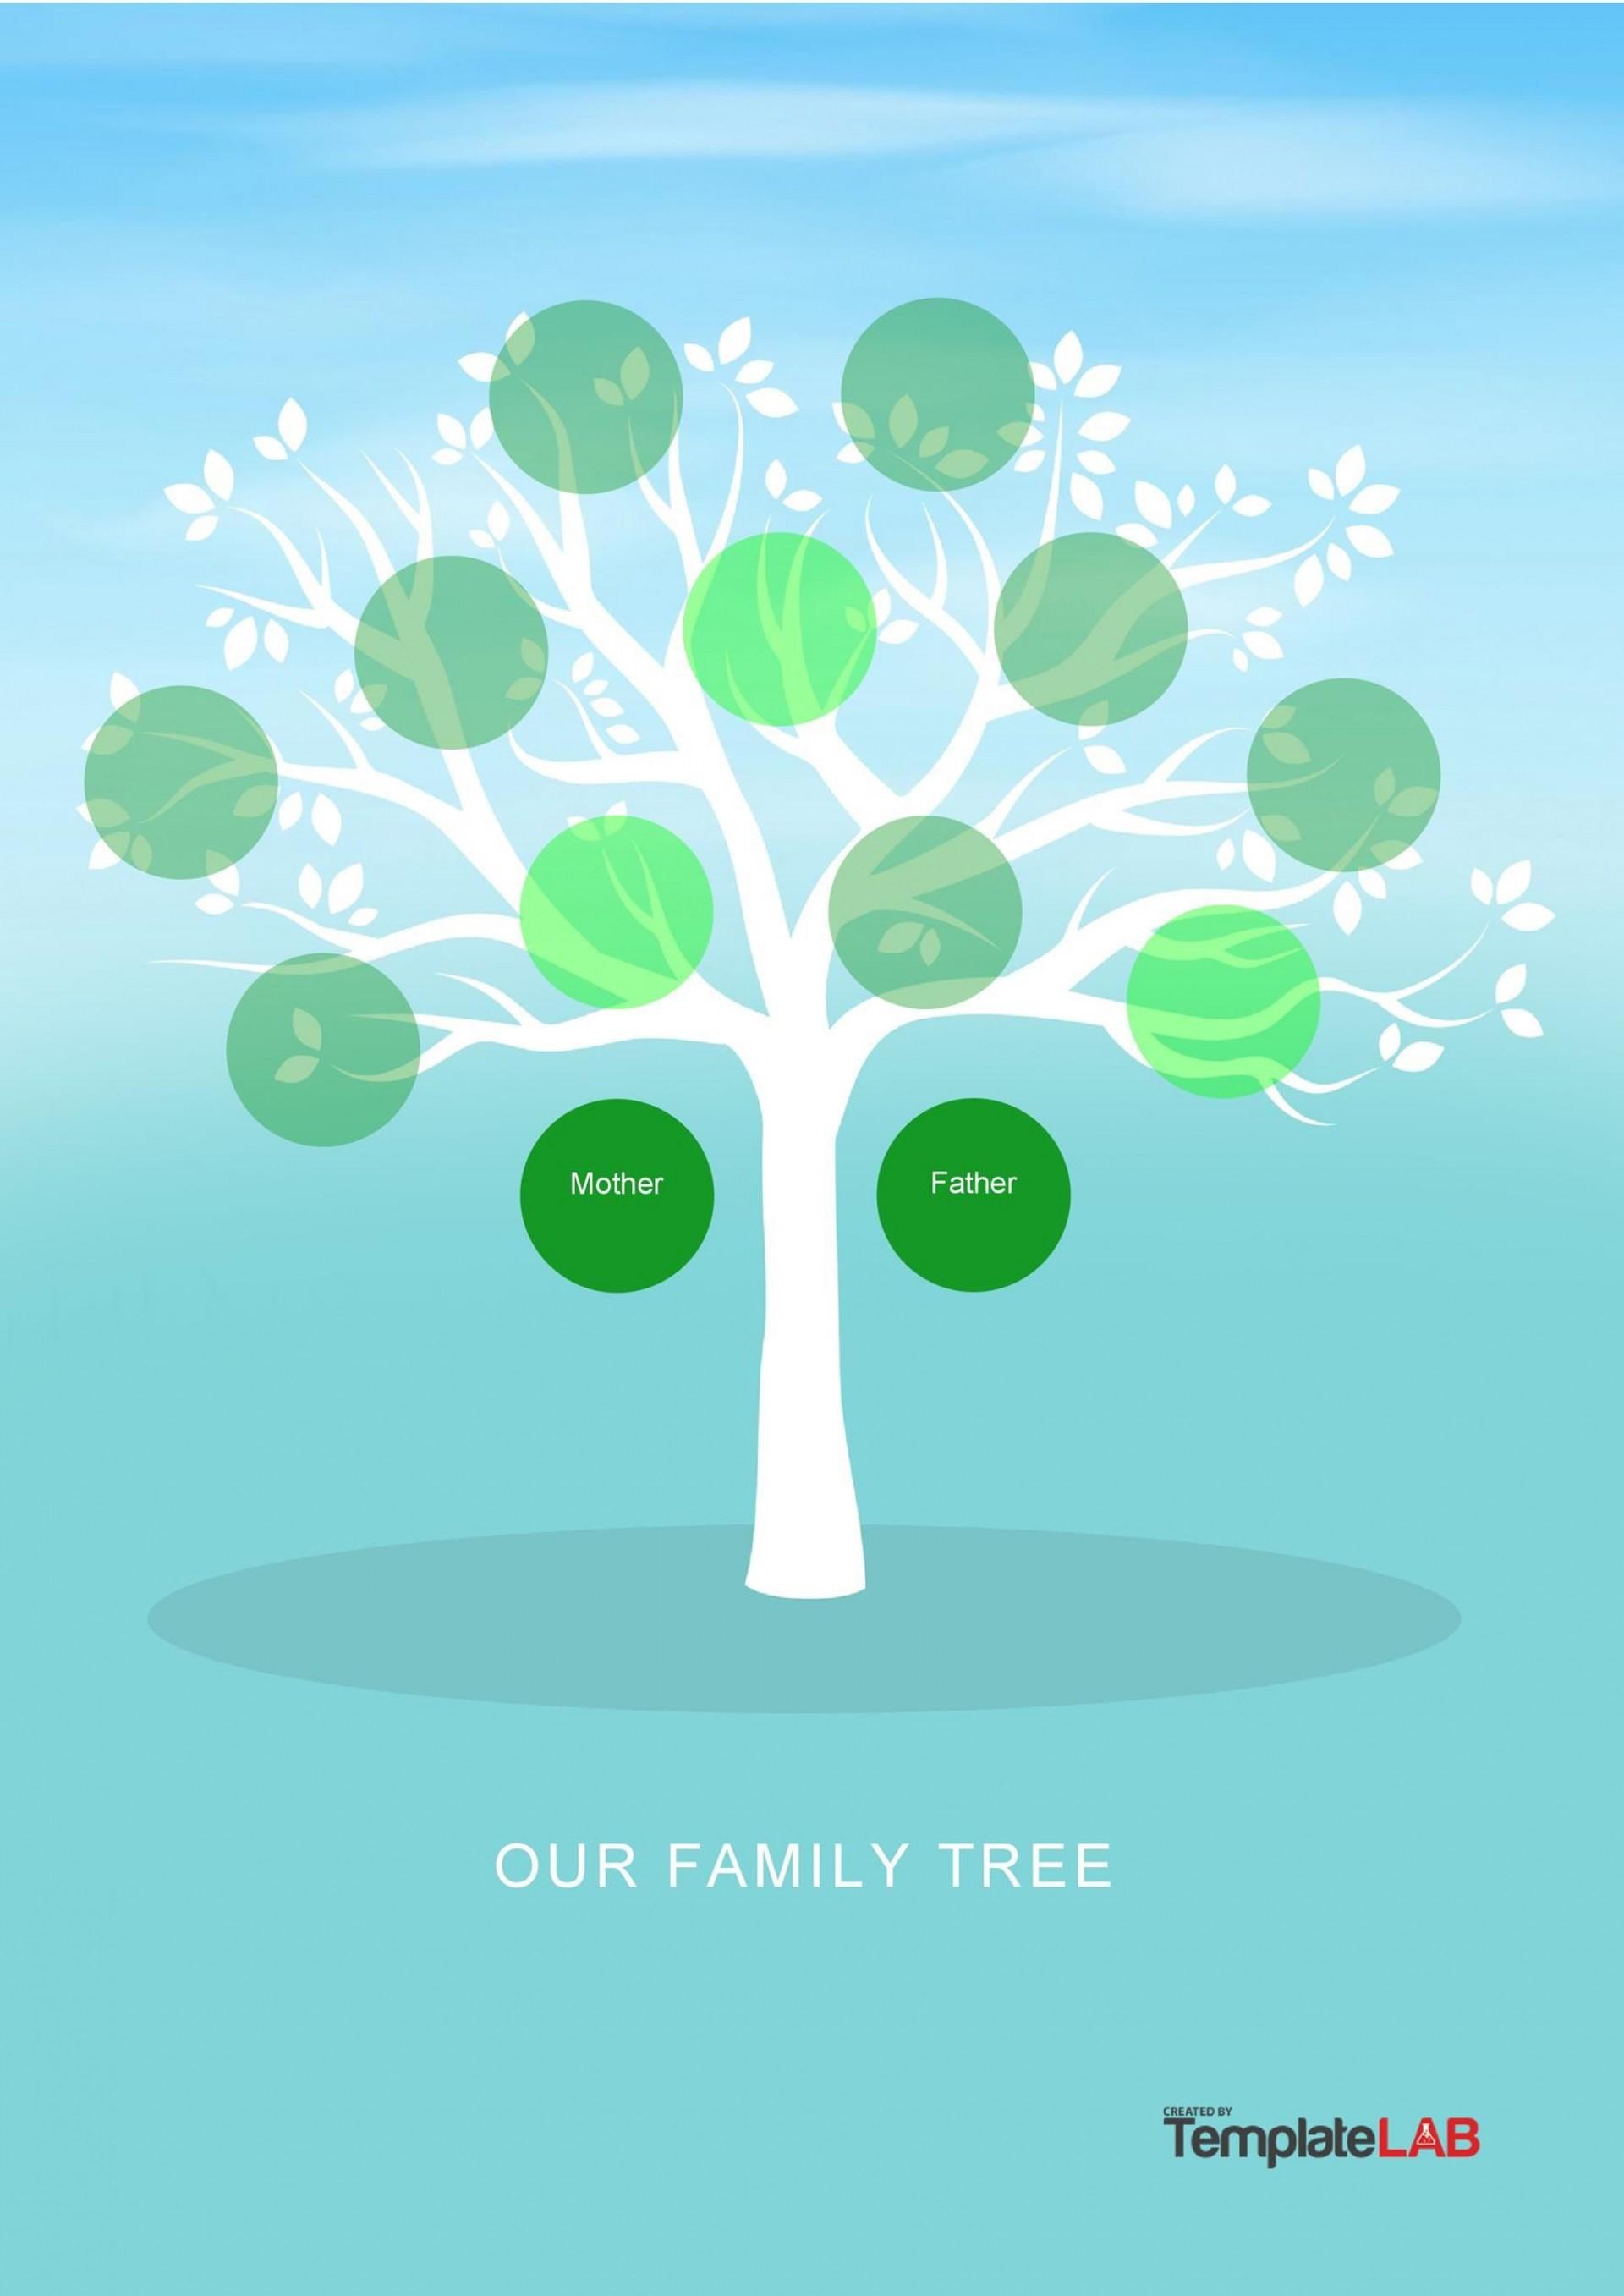 009 Dreaded Family Tree Book Template Word Photo  History1920